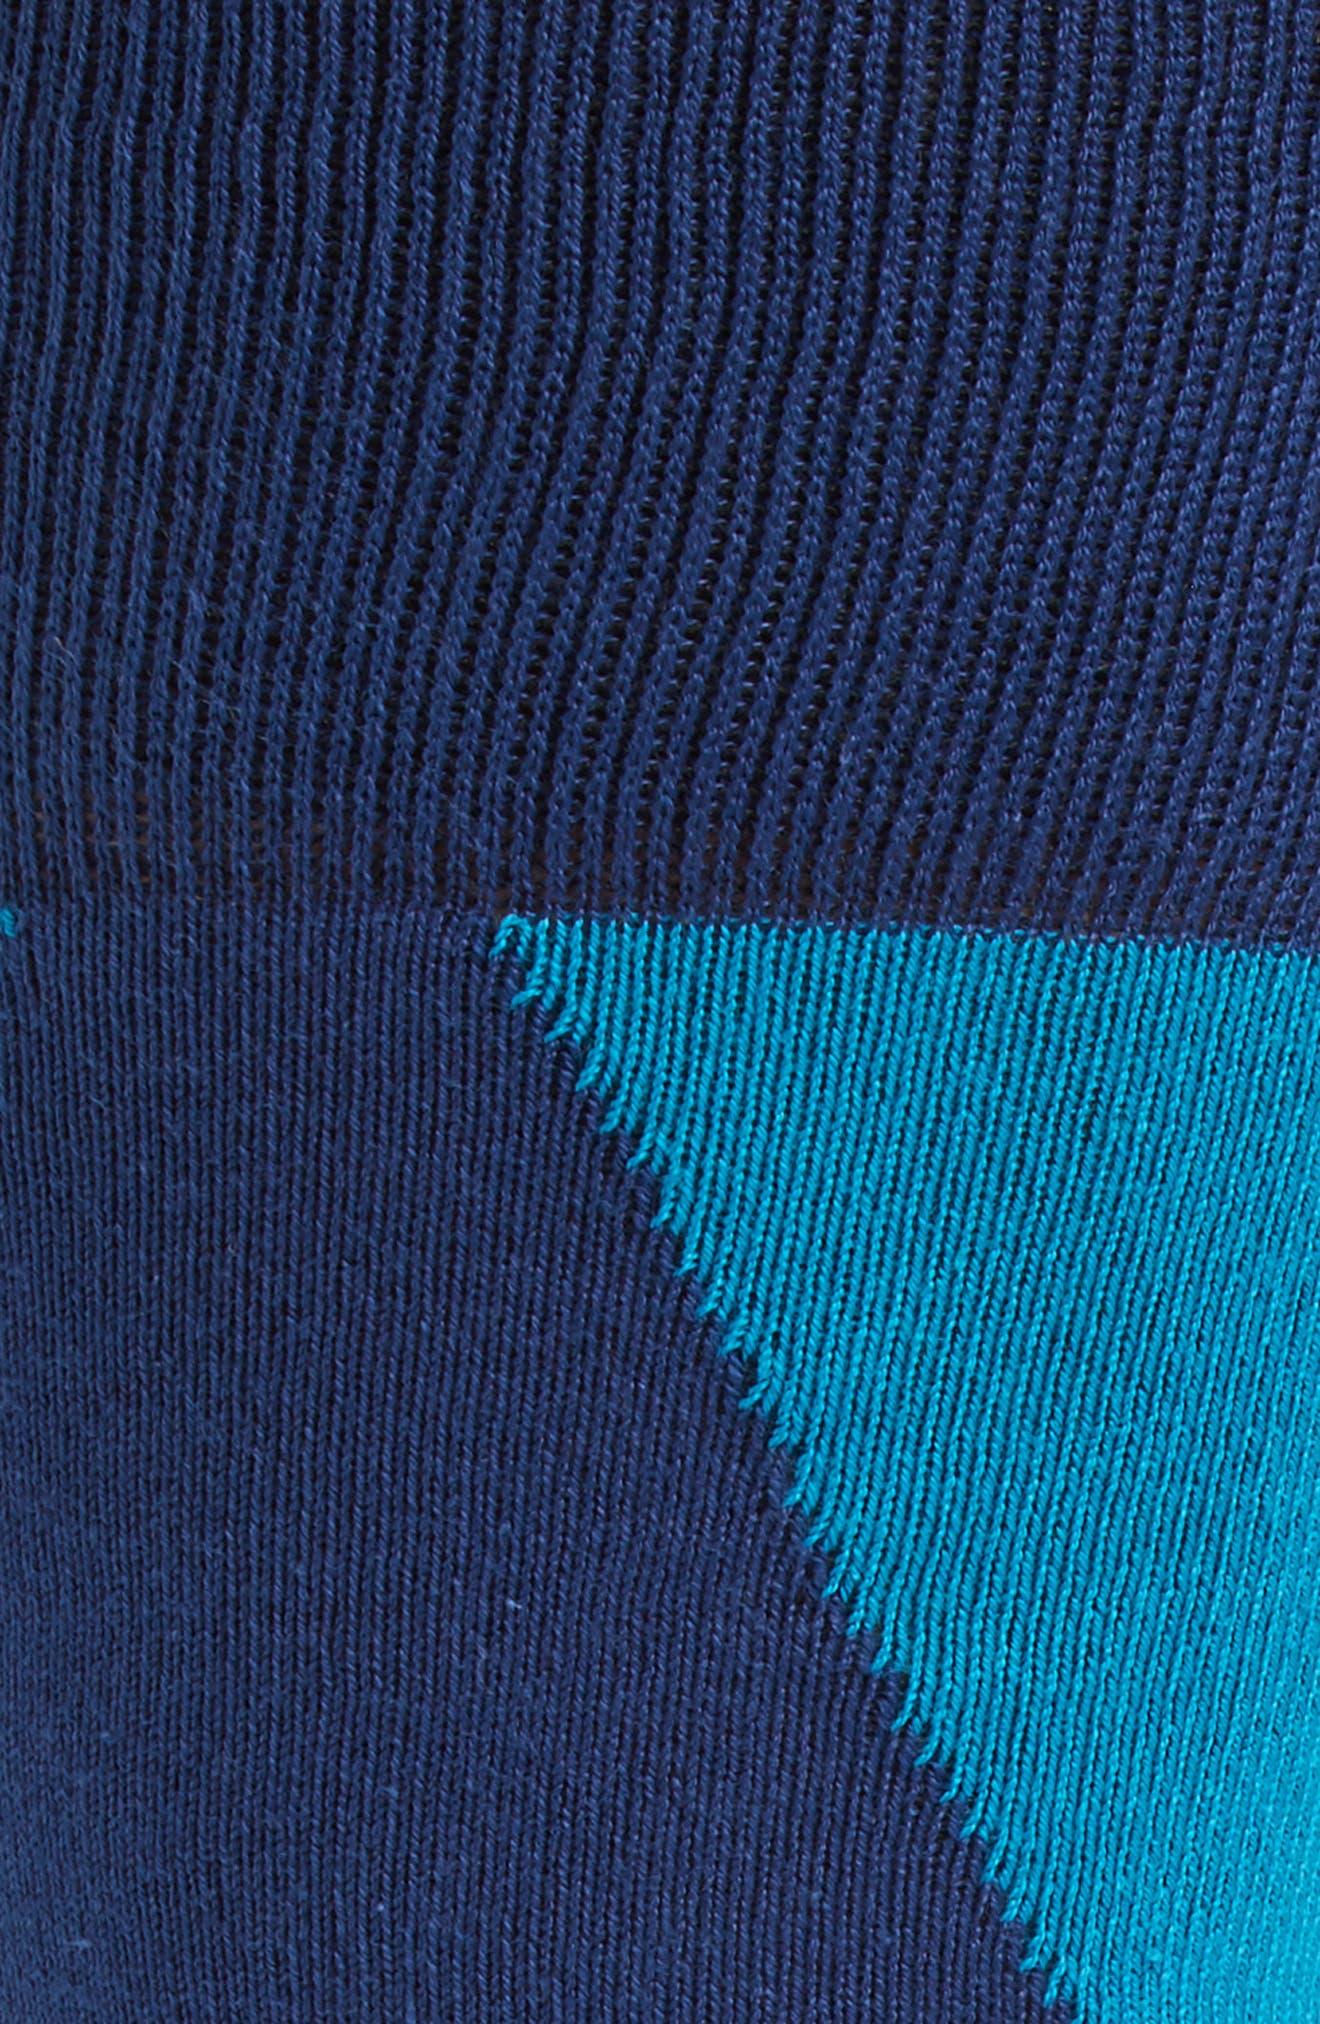 Geo Geometric Socks,                             Alternate thumbnail 2, color,                             400